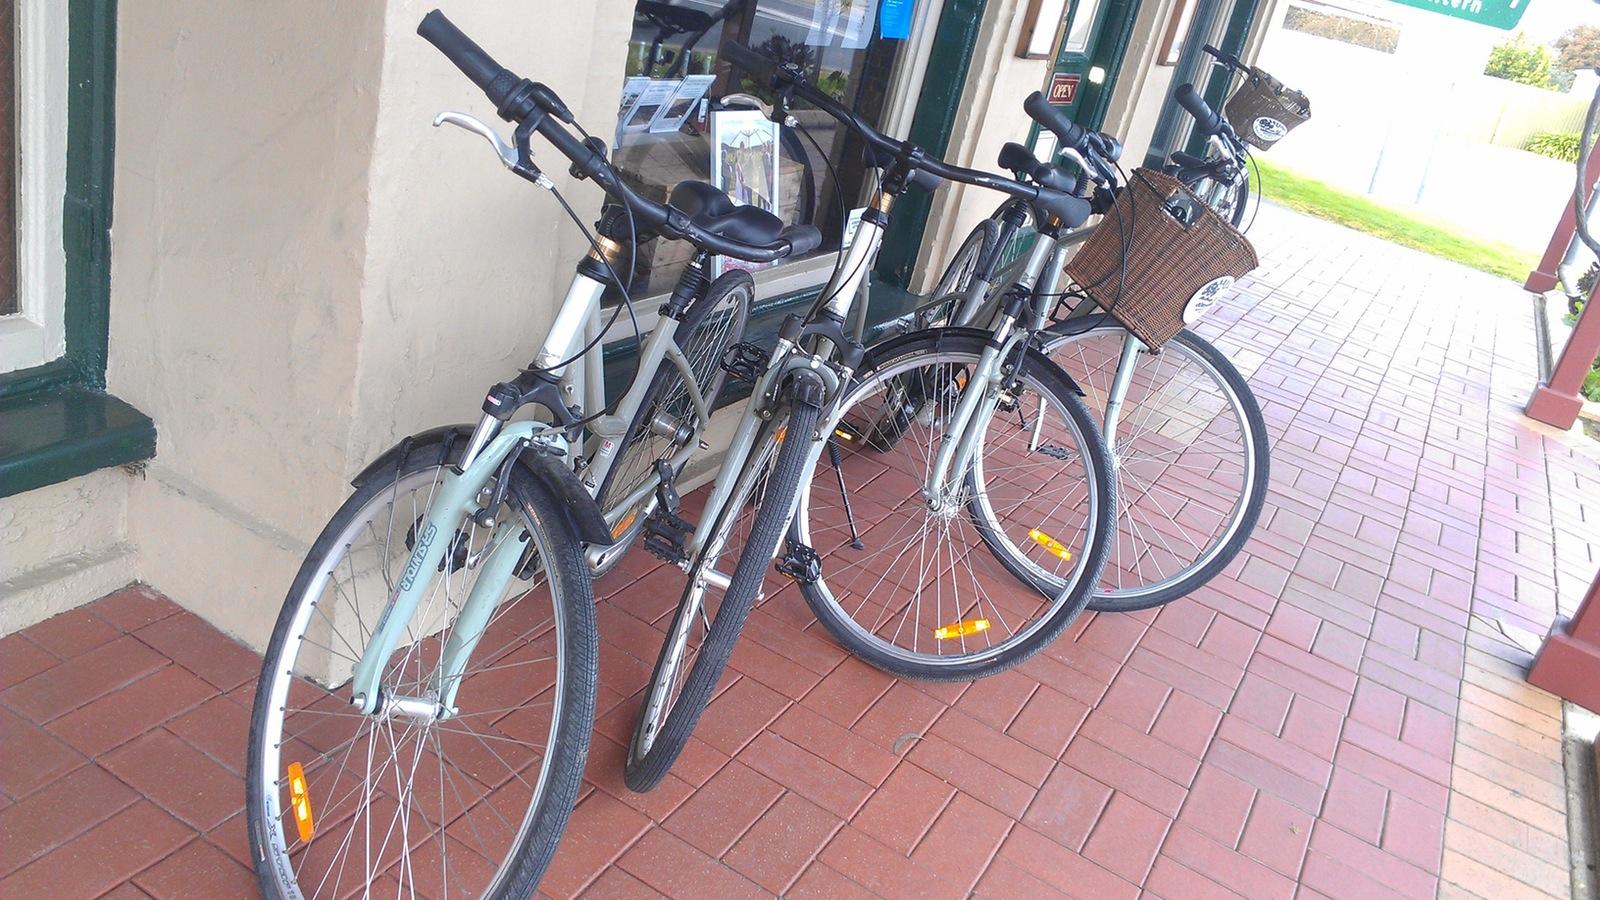 Bikes at Rutherglen Wine Experience